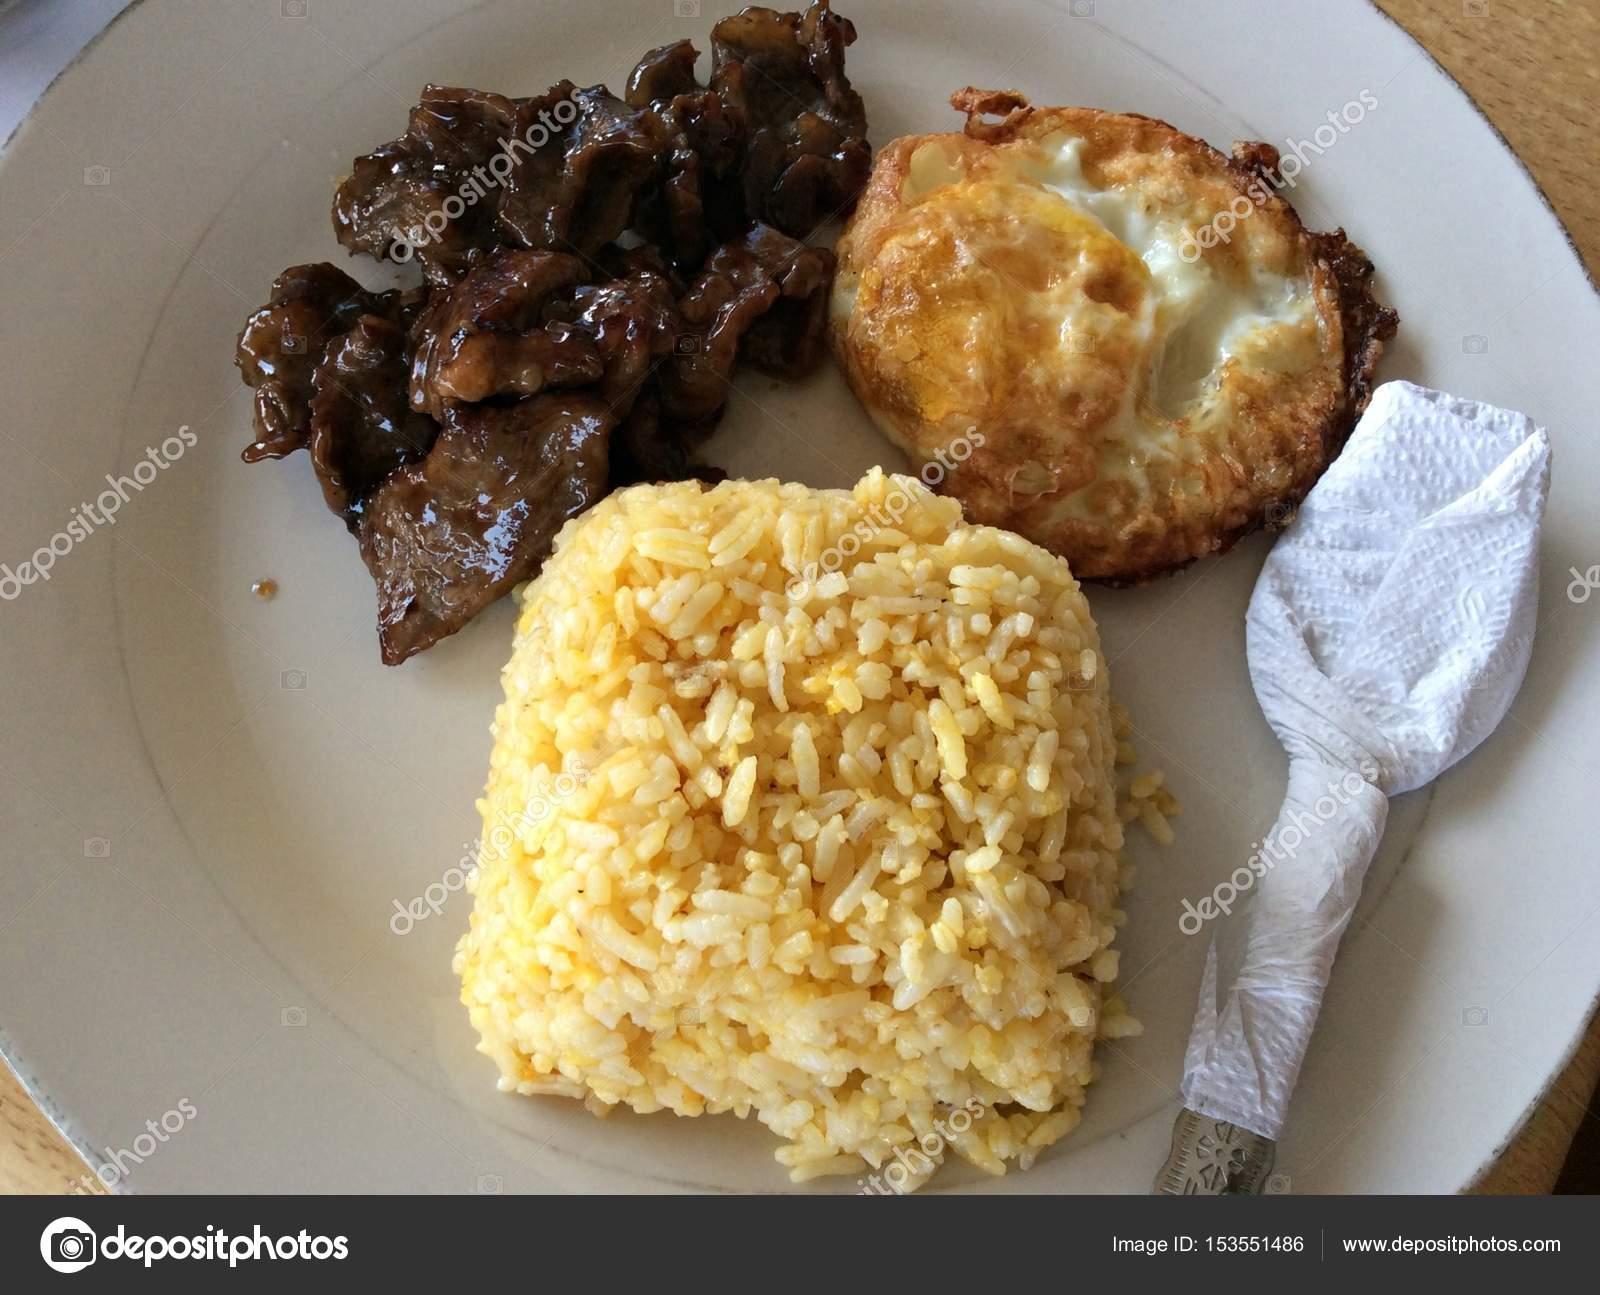 Tapsilog Favorite Filipino Budget Meal Stock Photo Image By C Raksybh 153551486